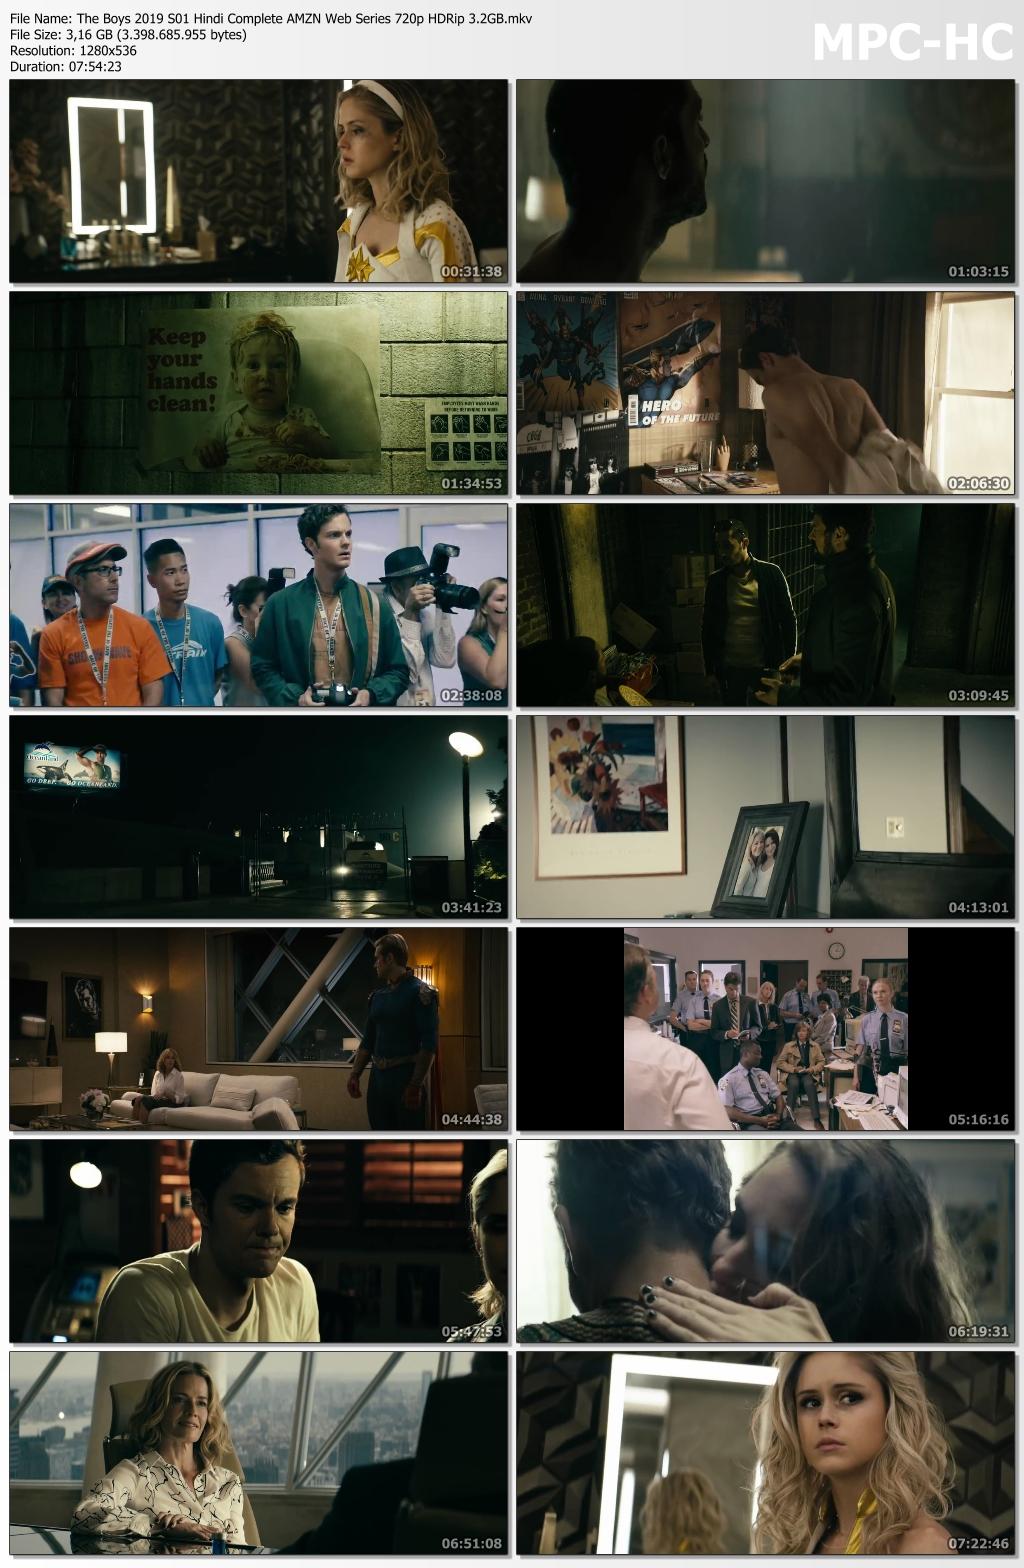 The-Boys-2019-S01-Hindi-Complete-AMZN-Web-Series-720p-HDRip-3-2-GB-mkv-thumbs